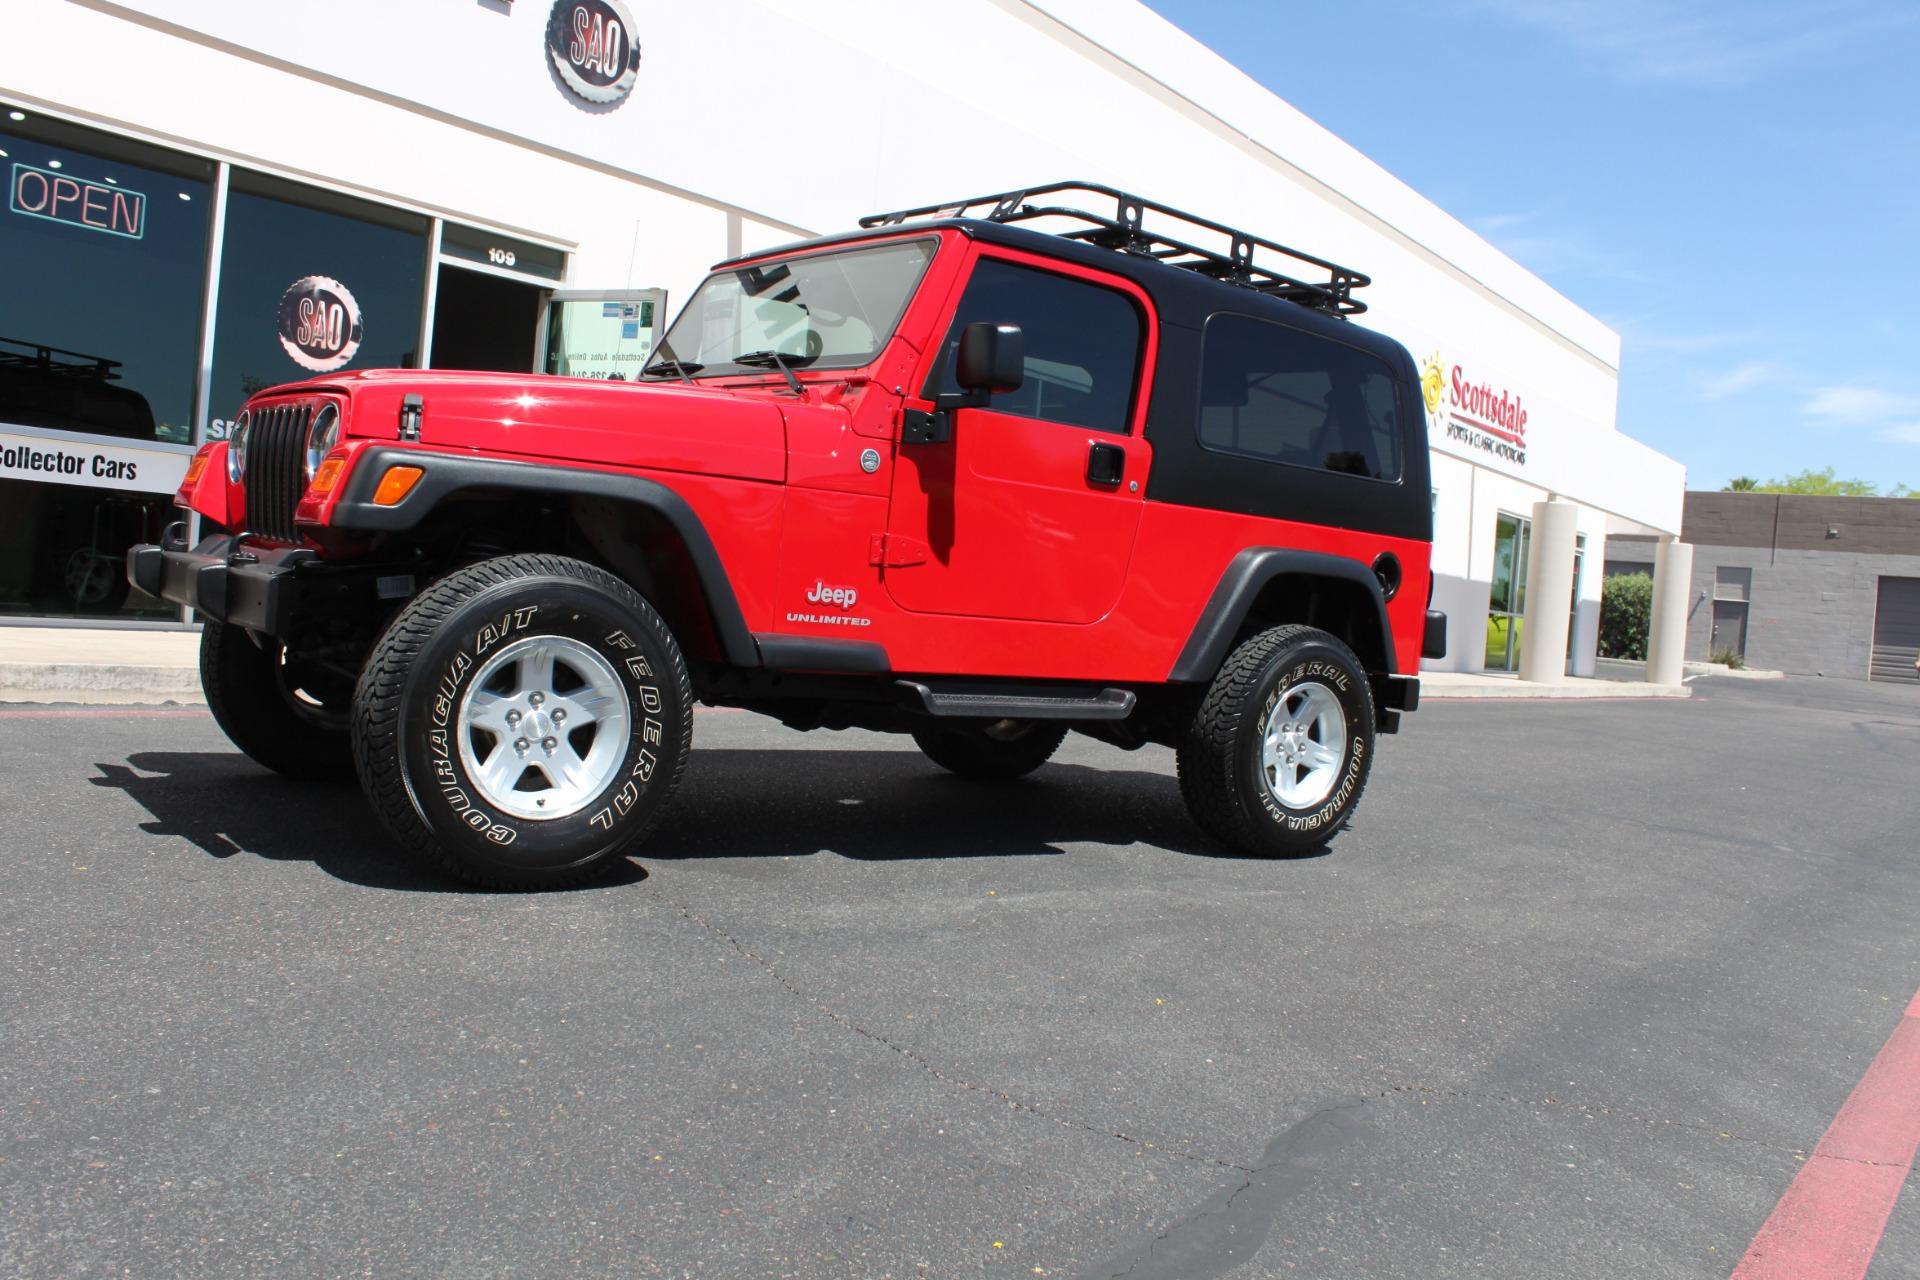 Used-2006-Jeep-Wrangler-4X4-LJ-Unlimited-LWB-Lexus